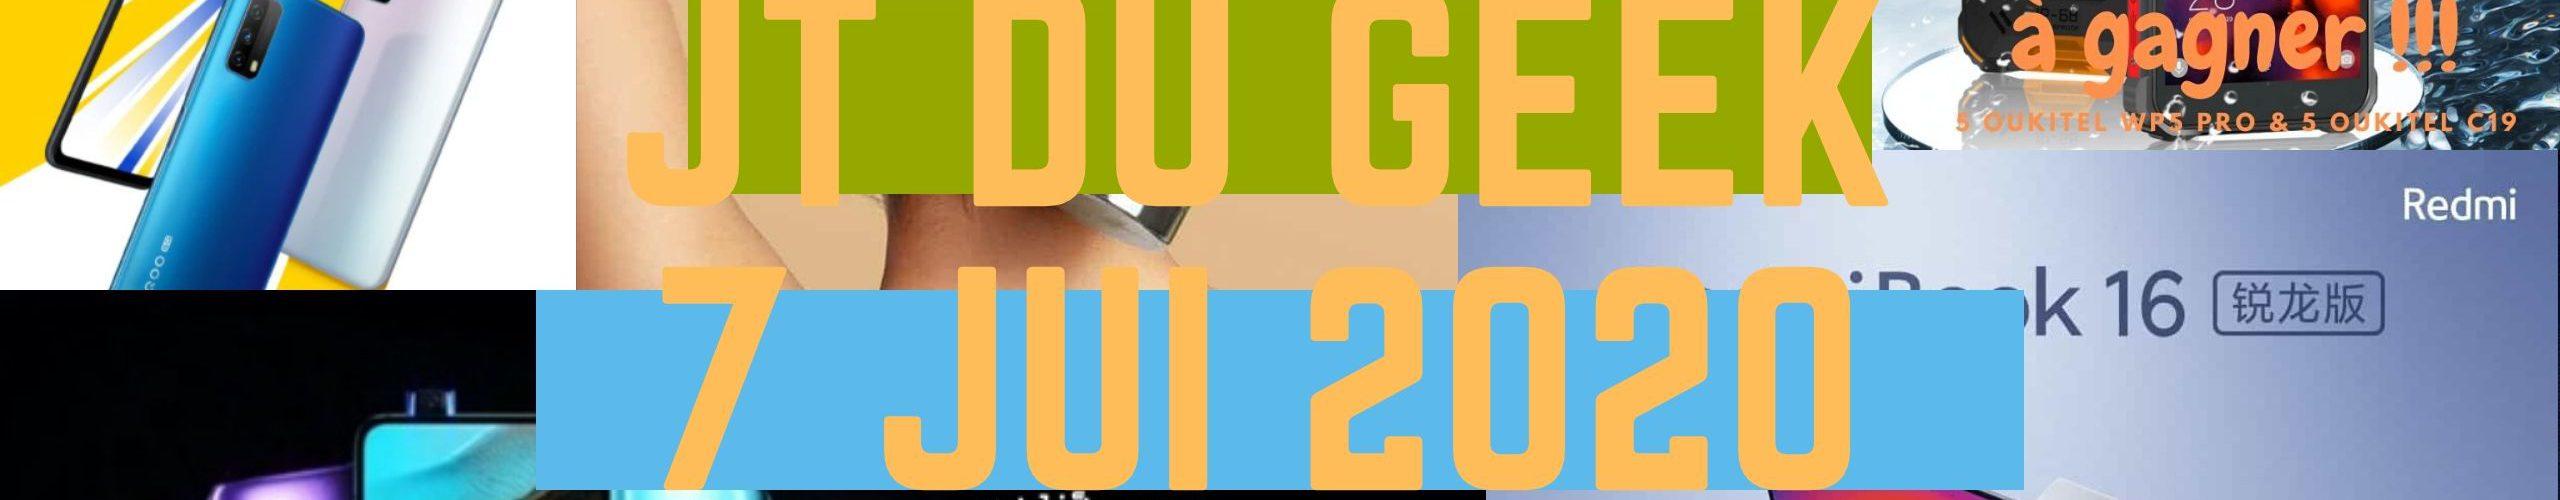 Zap Actu High Tech 7 Jui,redmibook 16 Intel, Mi Band 4c,redmi K30 Ultra, Pc Huawei, Iqoo Z1x, Oukitel Wp5 Pro